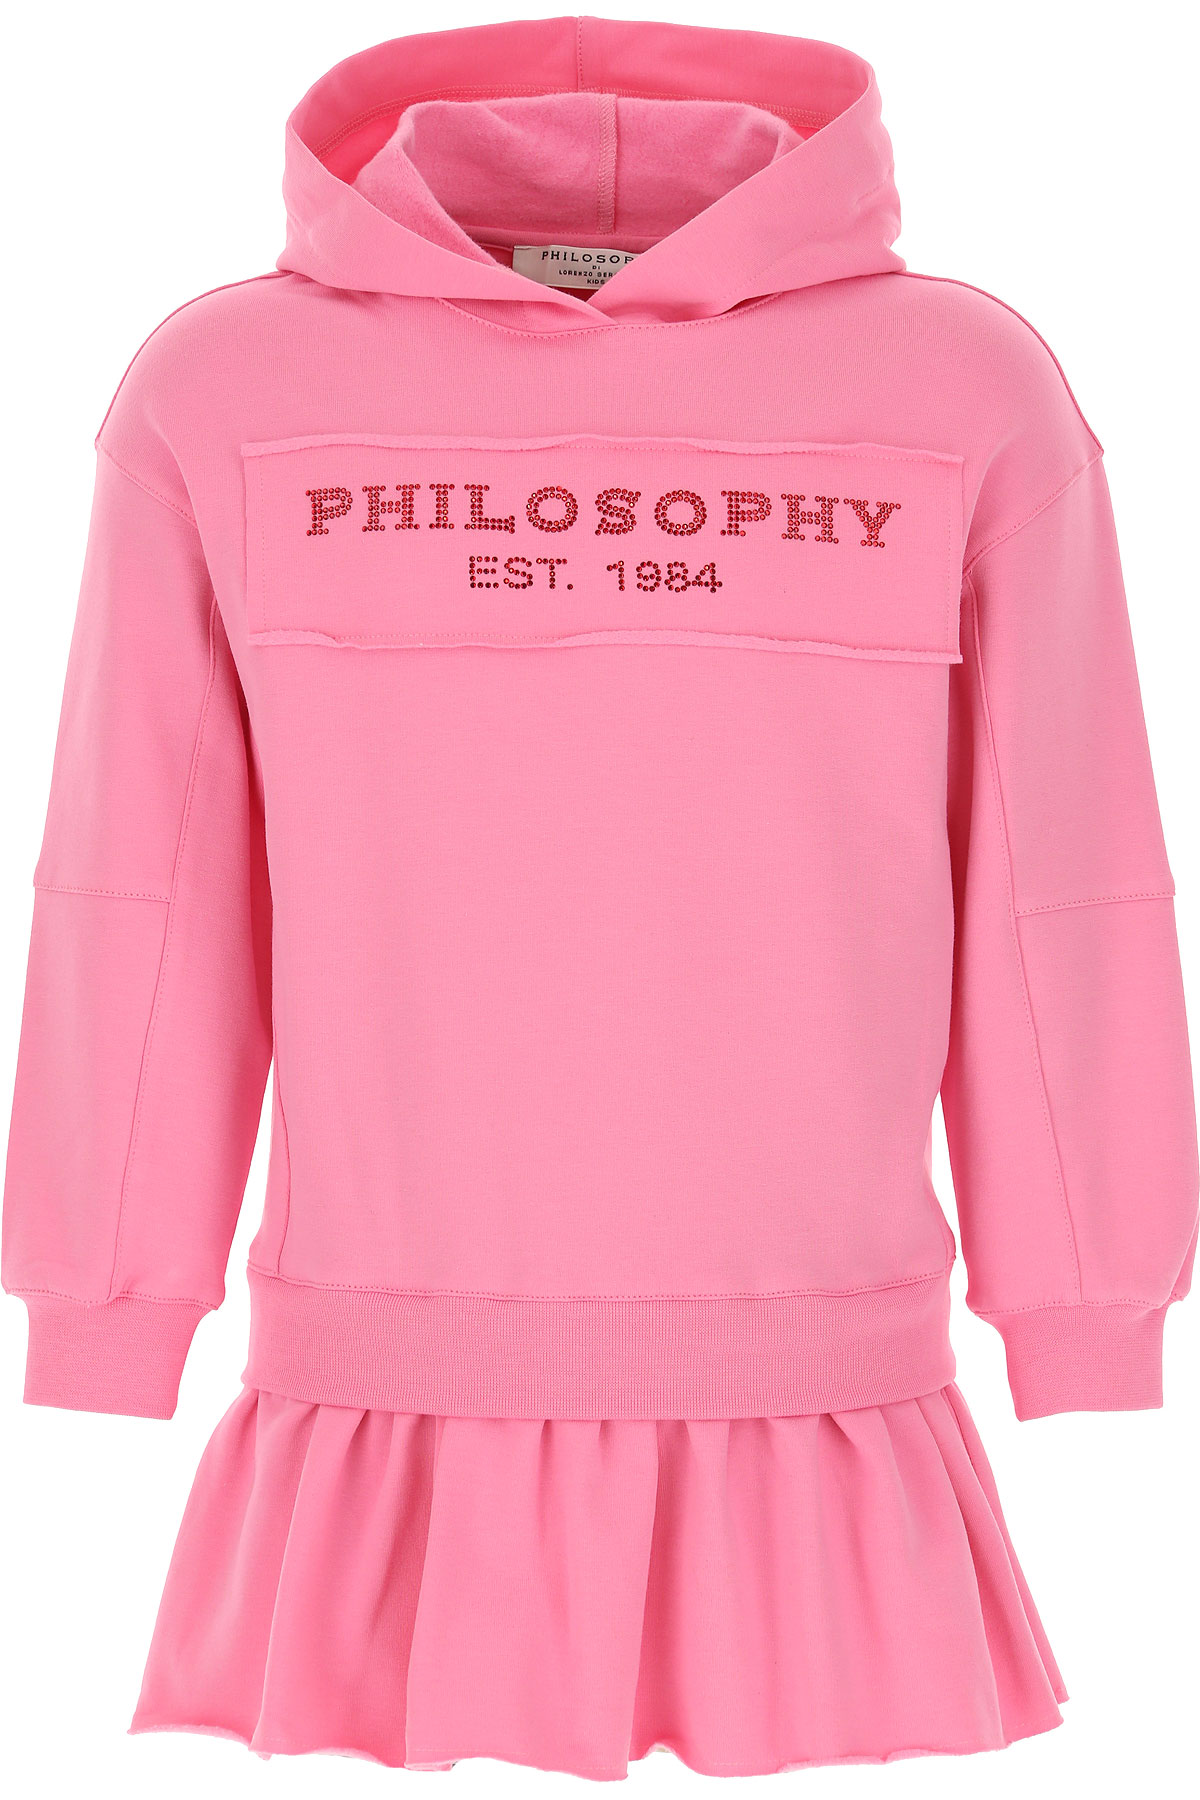 Philosophy di Lorenzo Serafini Girls Dress On Sale, Bubble Pink, Cotton, 2019, 10Y 6Y 8Y